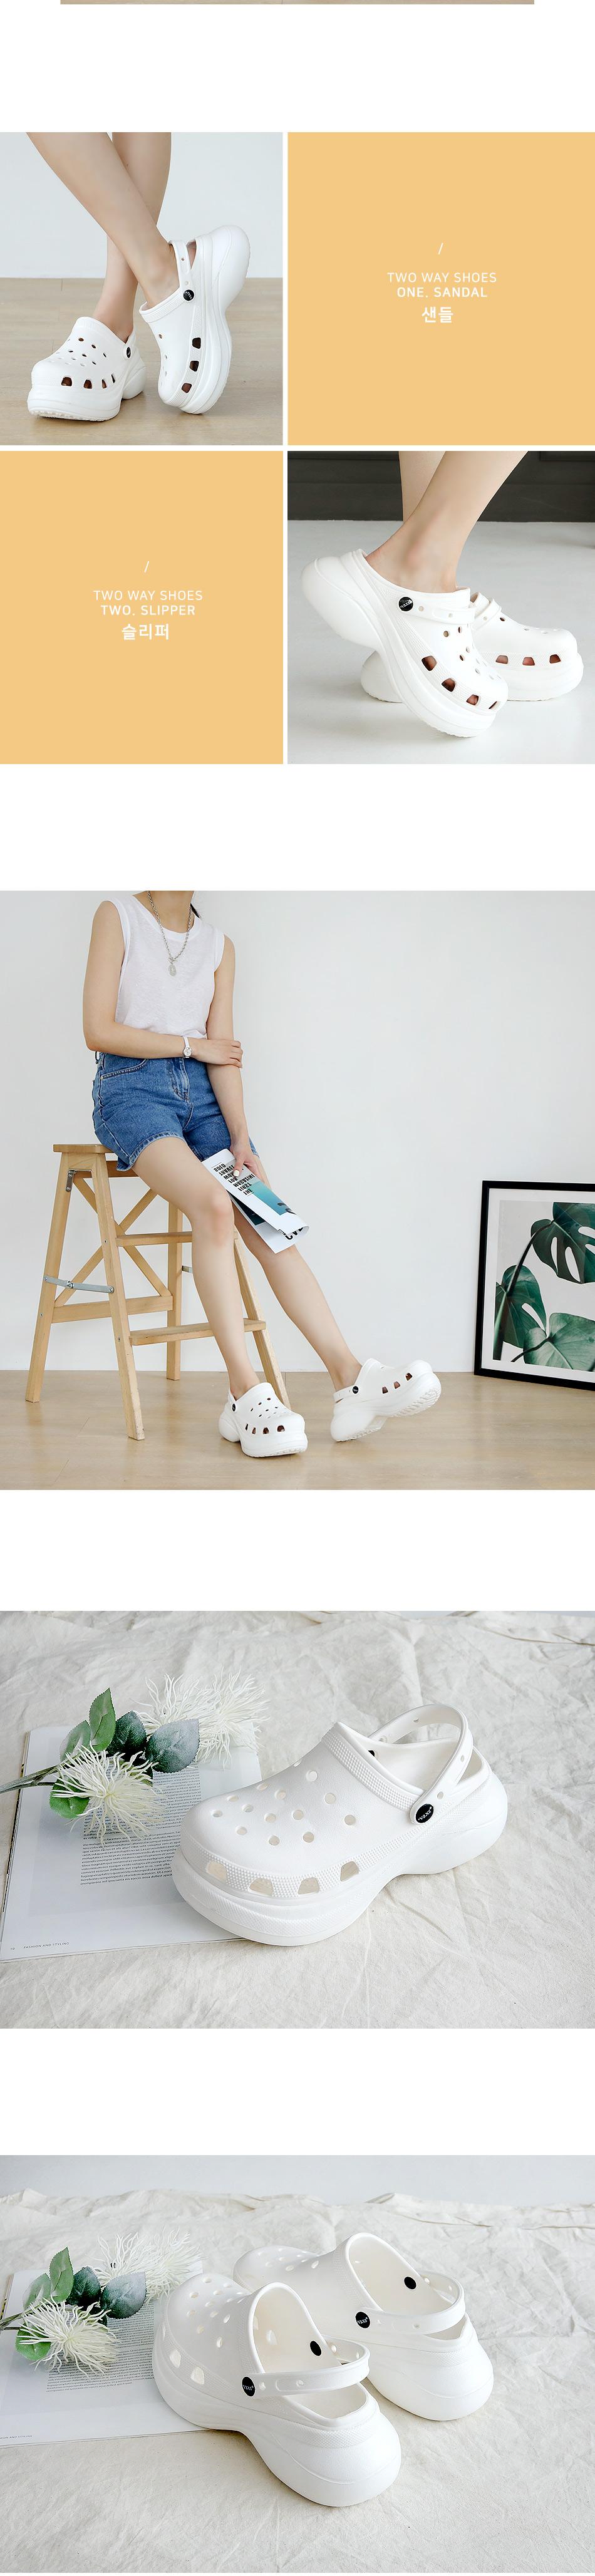 Croton 2 way sandals 6 cm